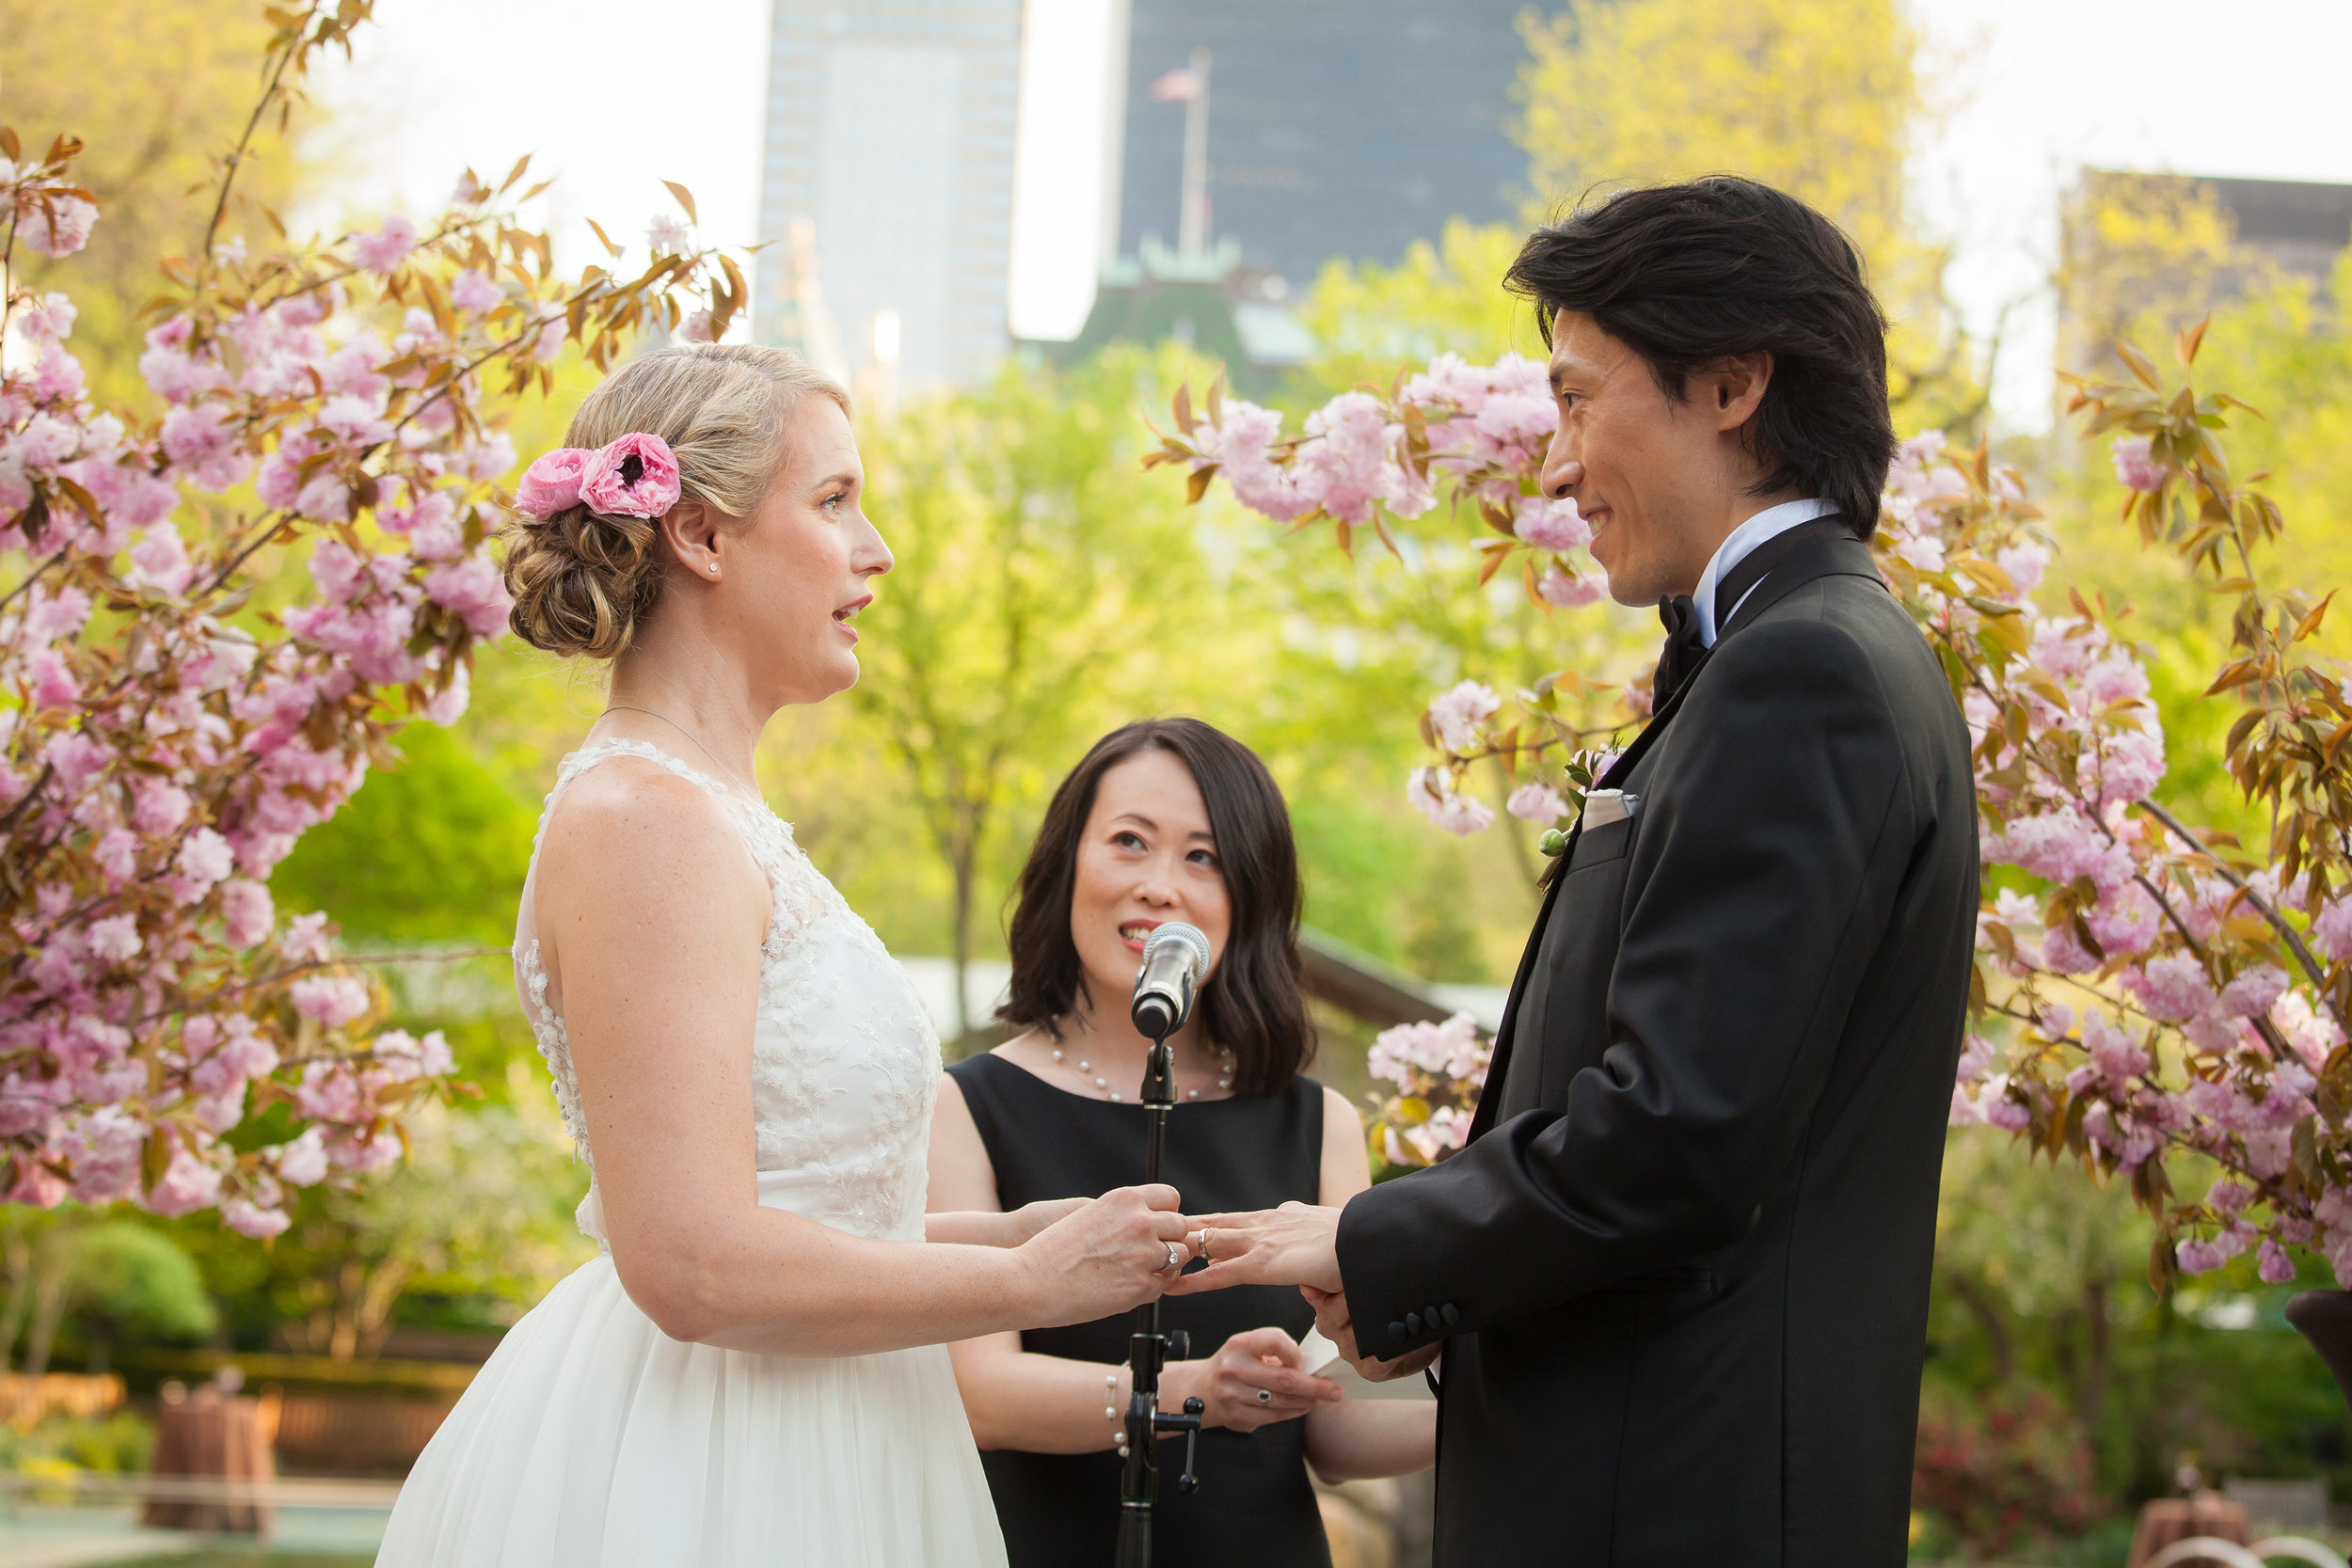 victorious-events-nyc-023-colleen-taka-central-park-zoo-wedding-raymond-hamlin.jpg